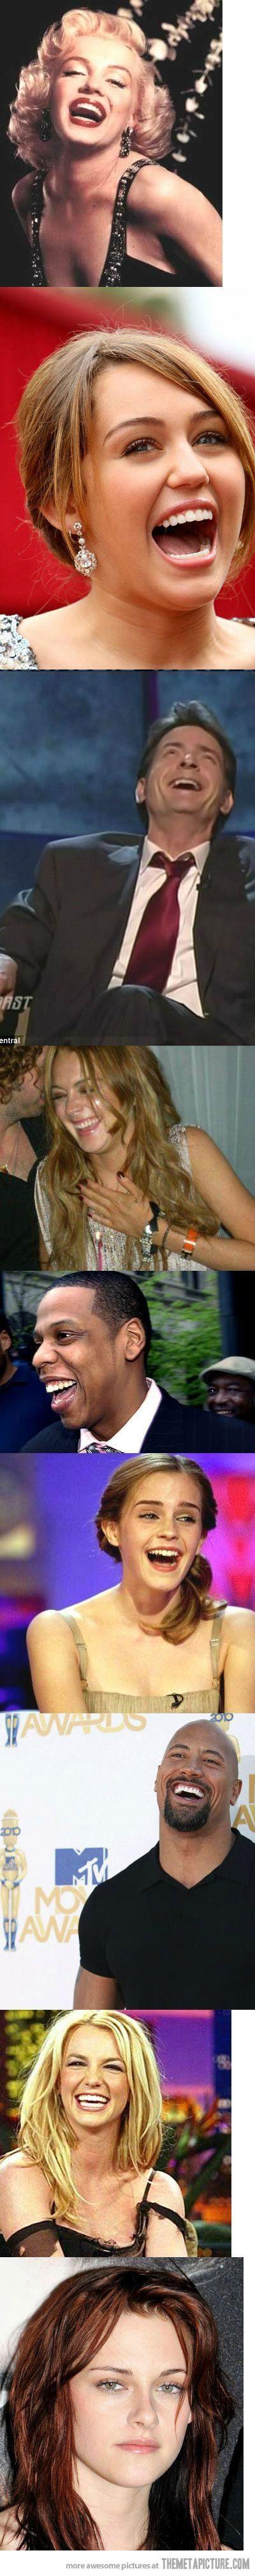 How famous celebrities laugh…